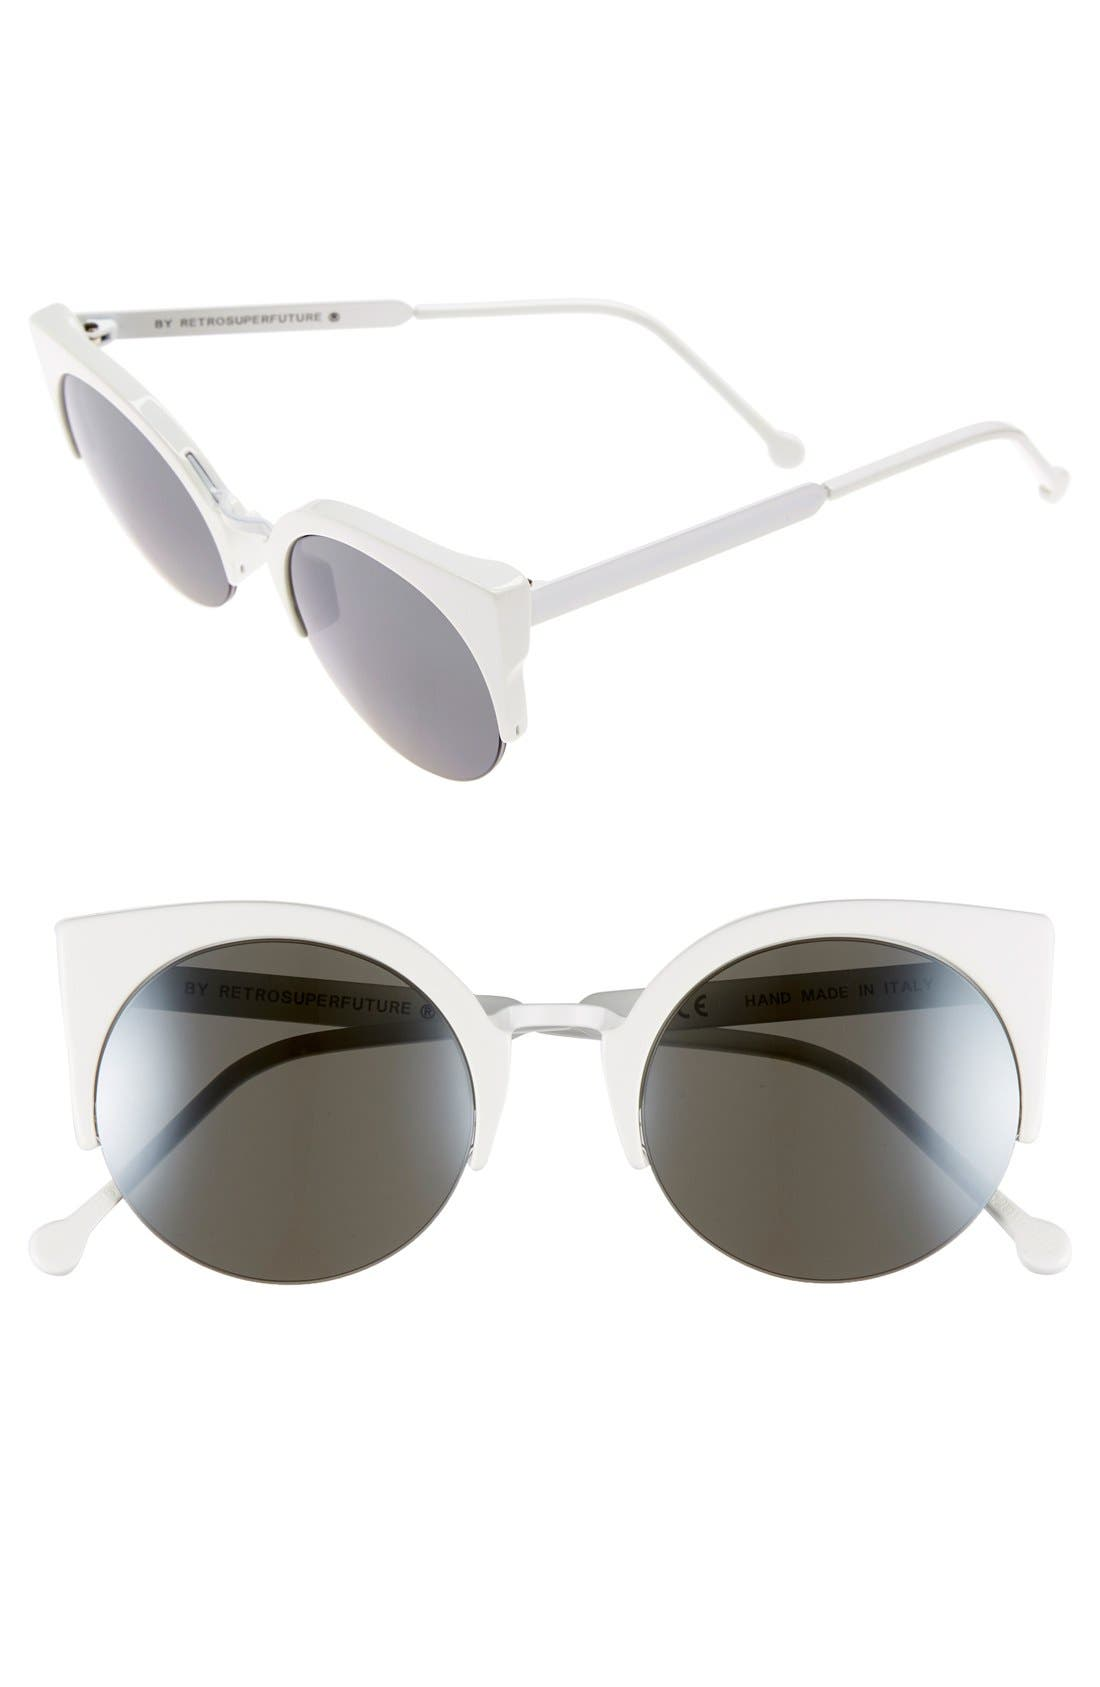 Main Image - SUPER by RETROSUPERFUTURE® 'Lucia Francis' 51mm Sunglasses